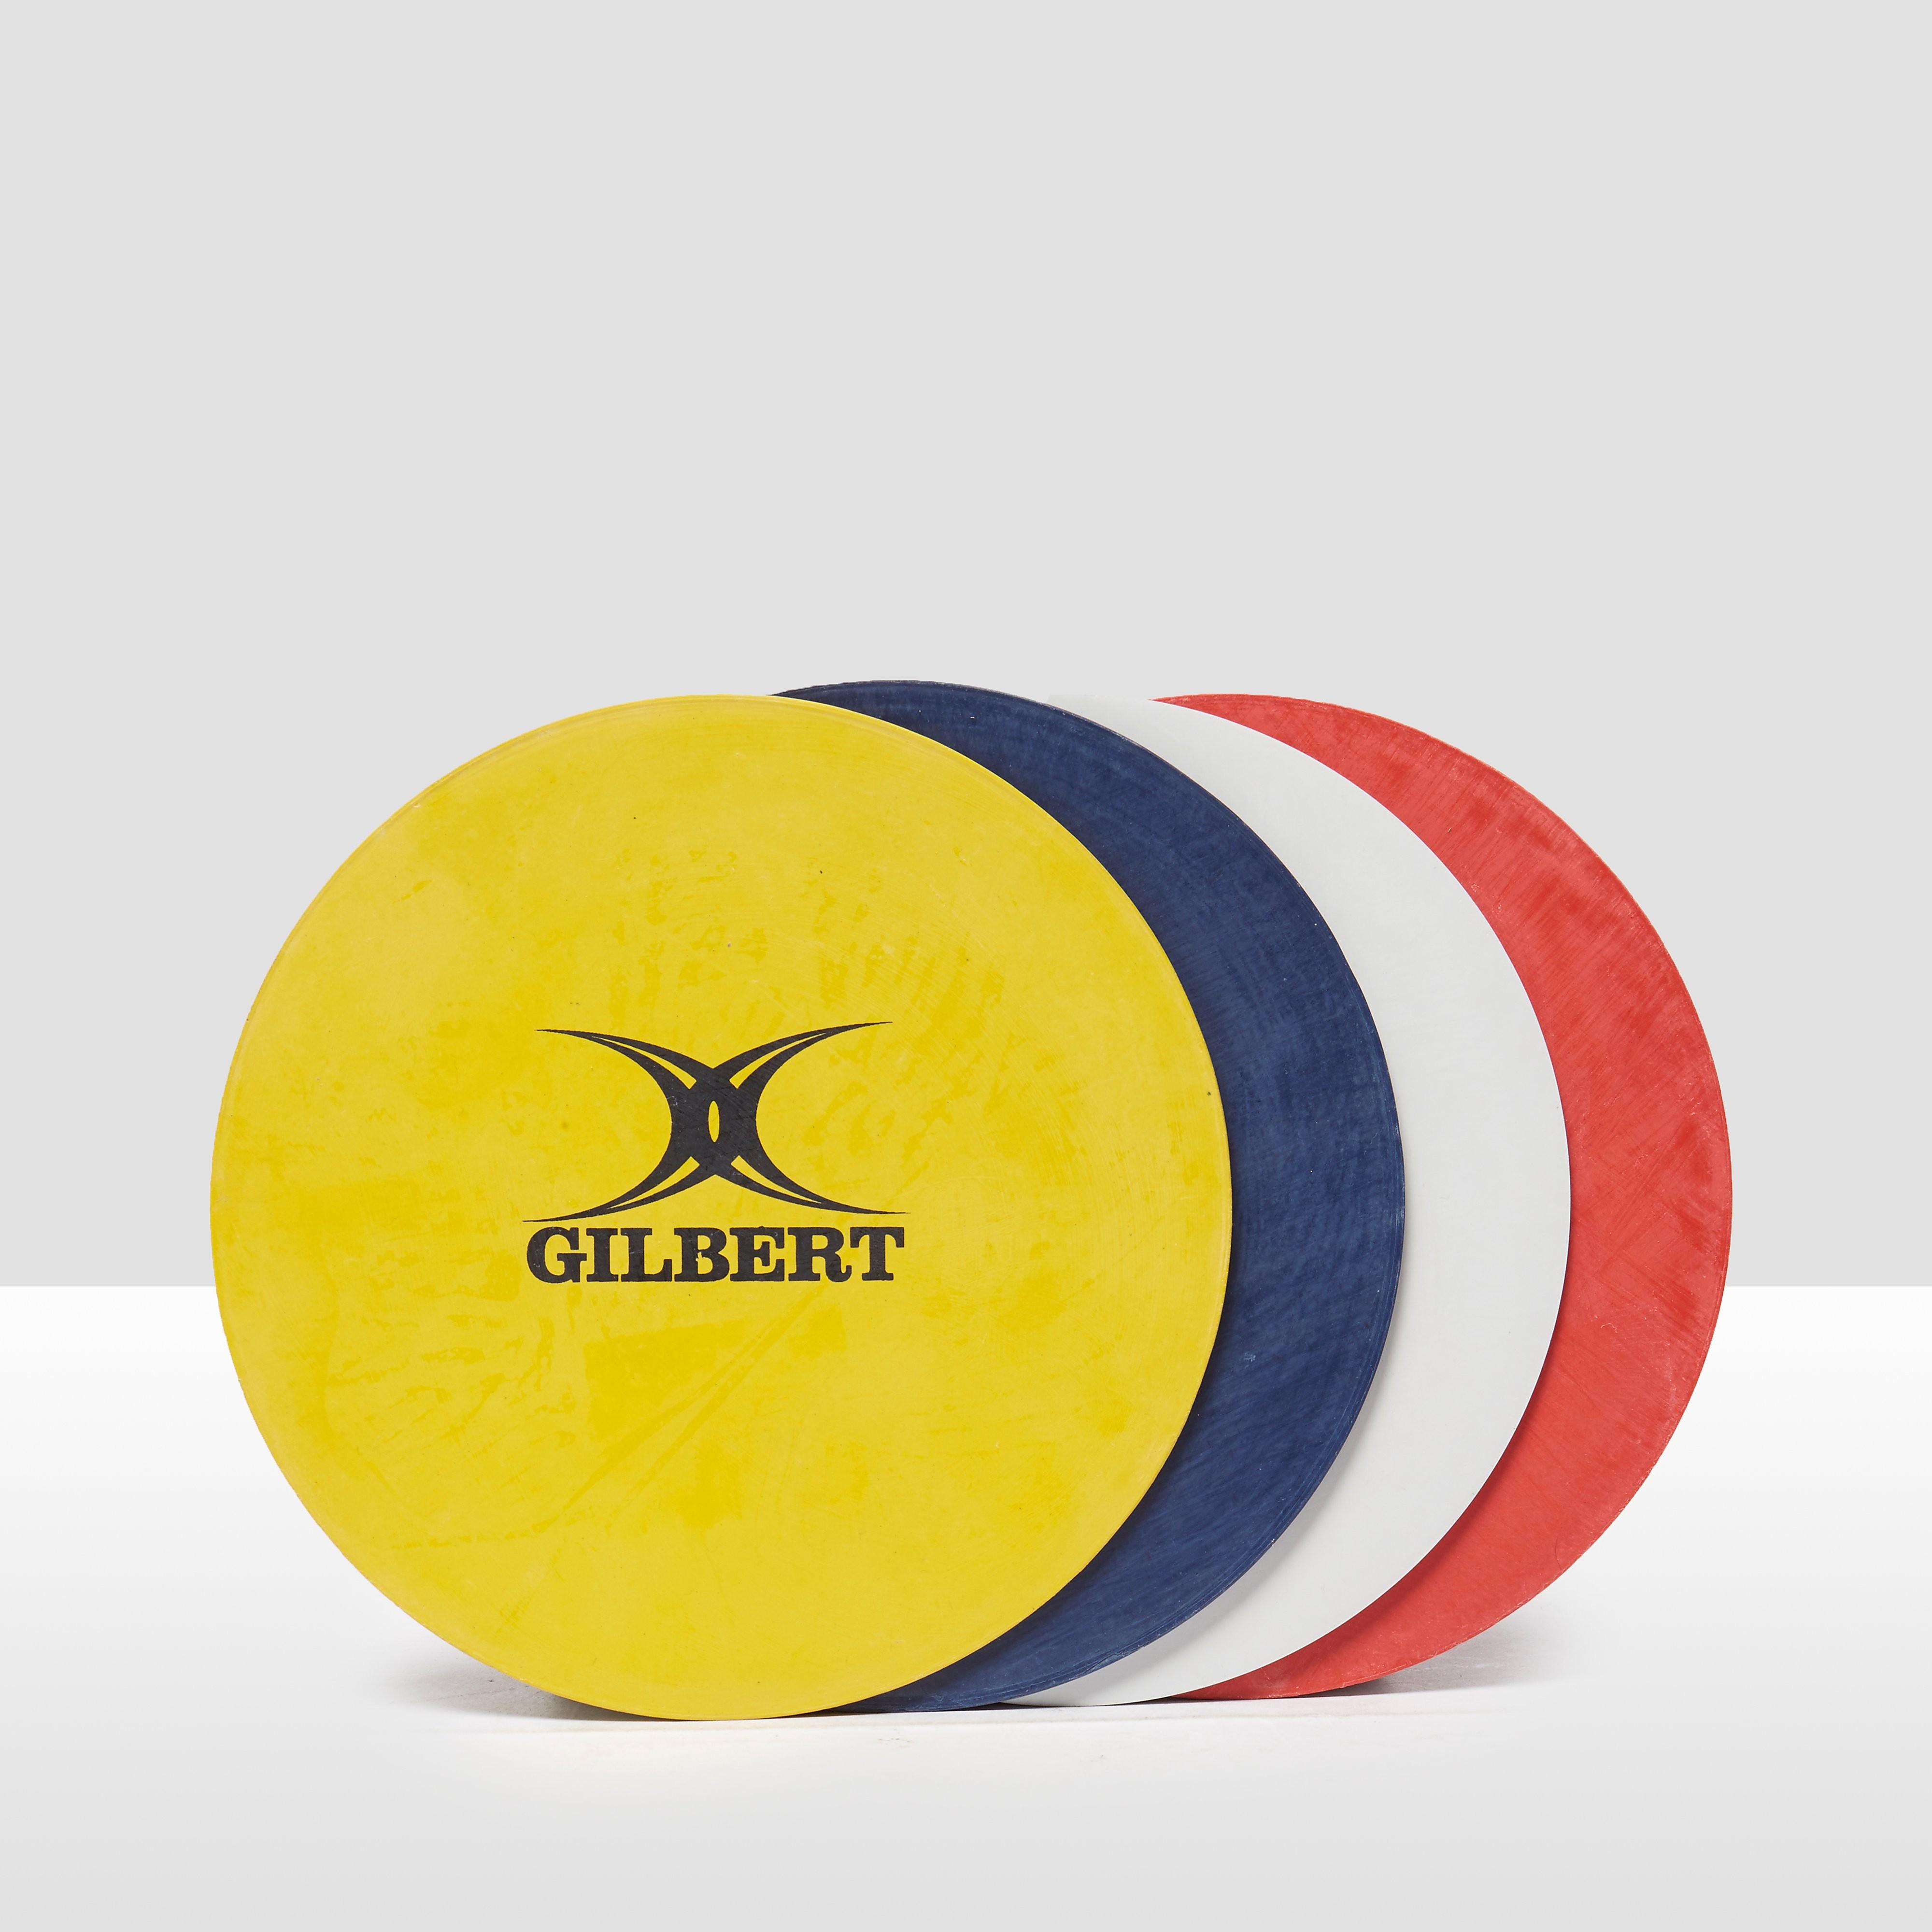 Gilbert Rubber Disk Pack (16)